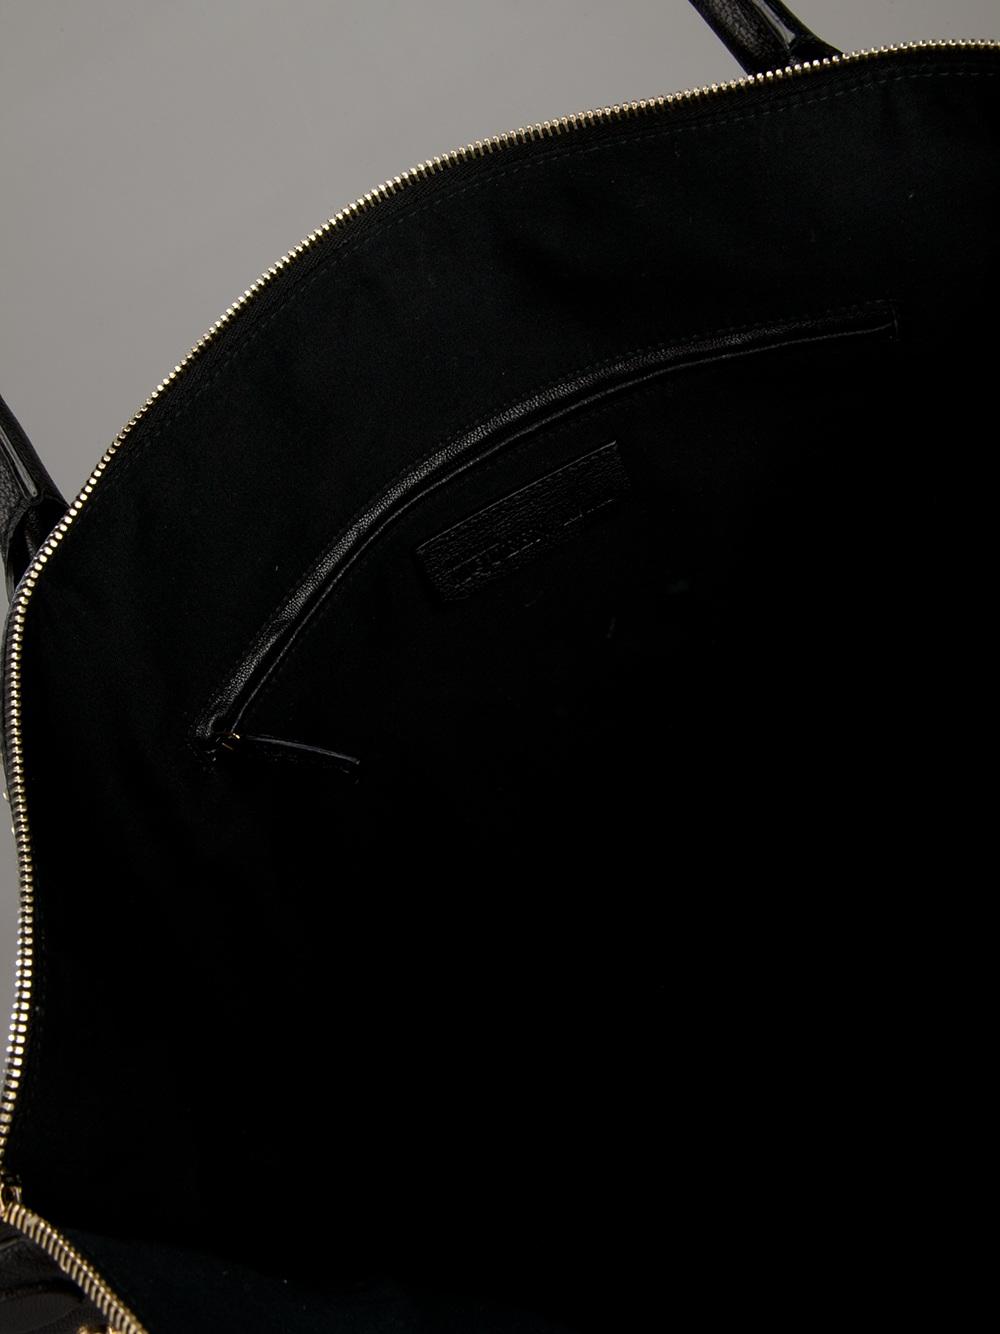 Alexander McQueen Large Contrast Stud Tote in Black